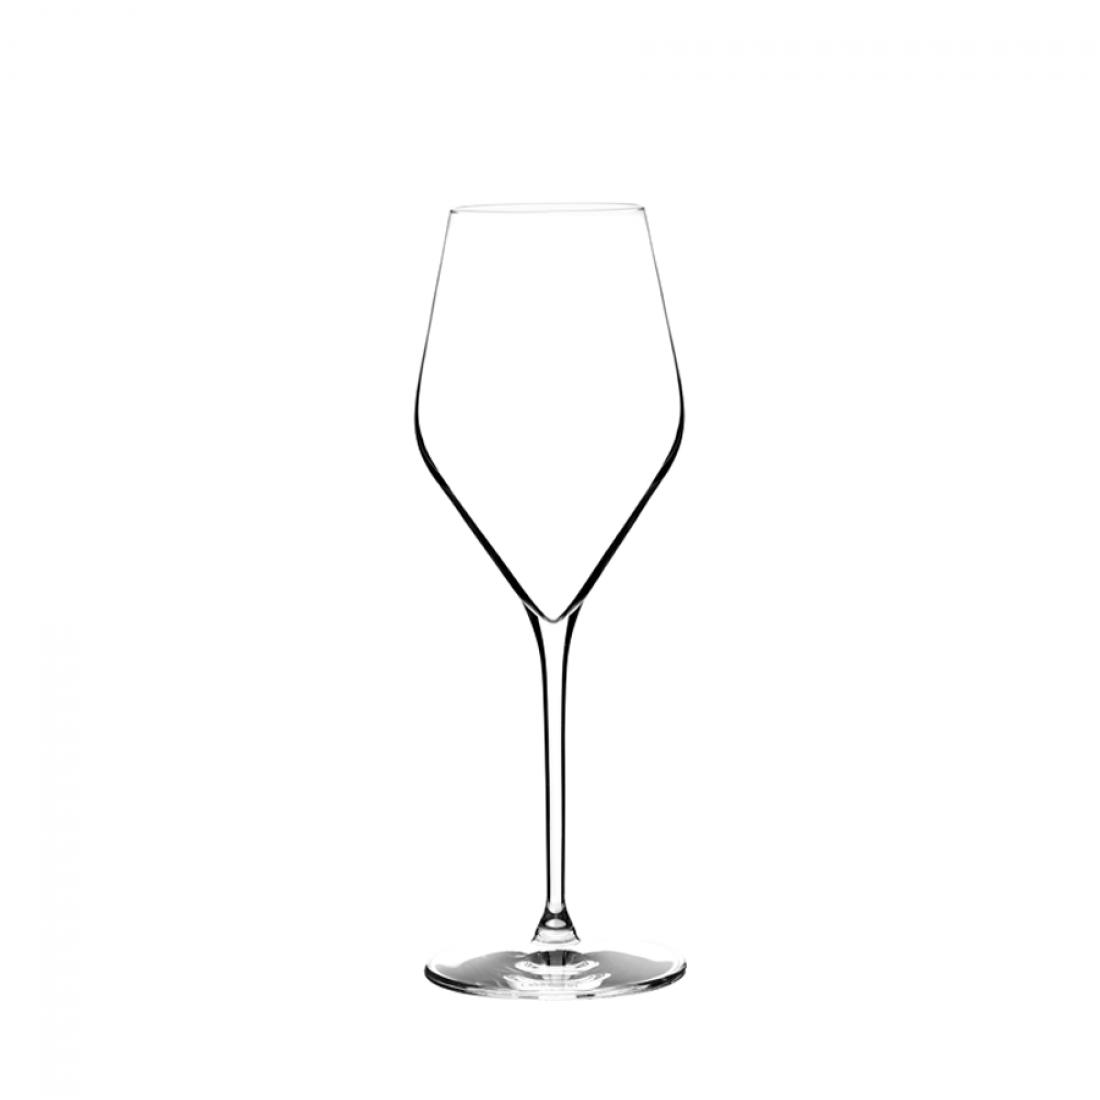 Kasse med 6 champagneglas Lehmann Absolus 30-34